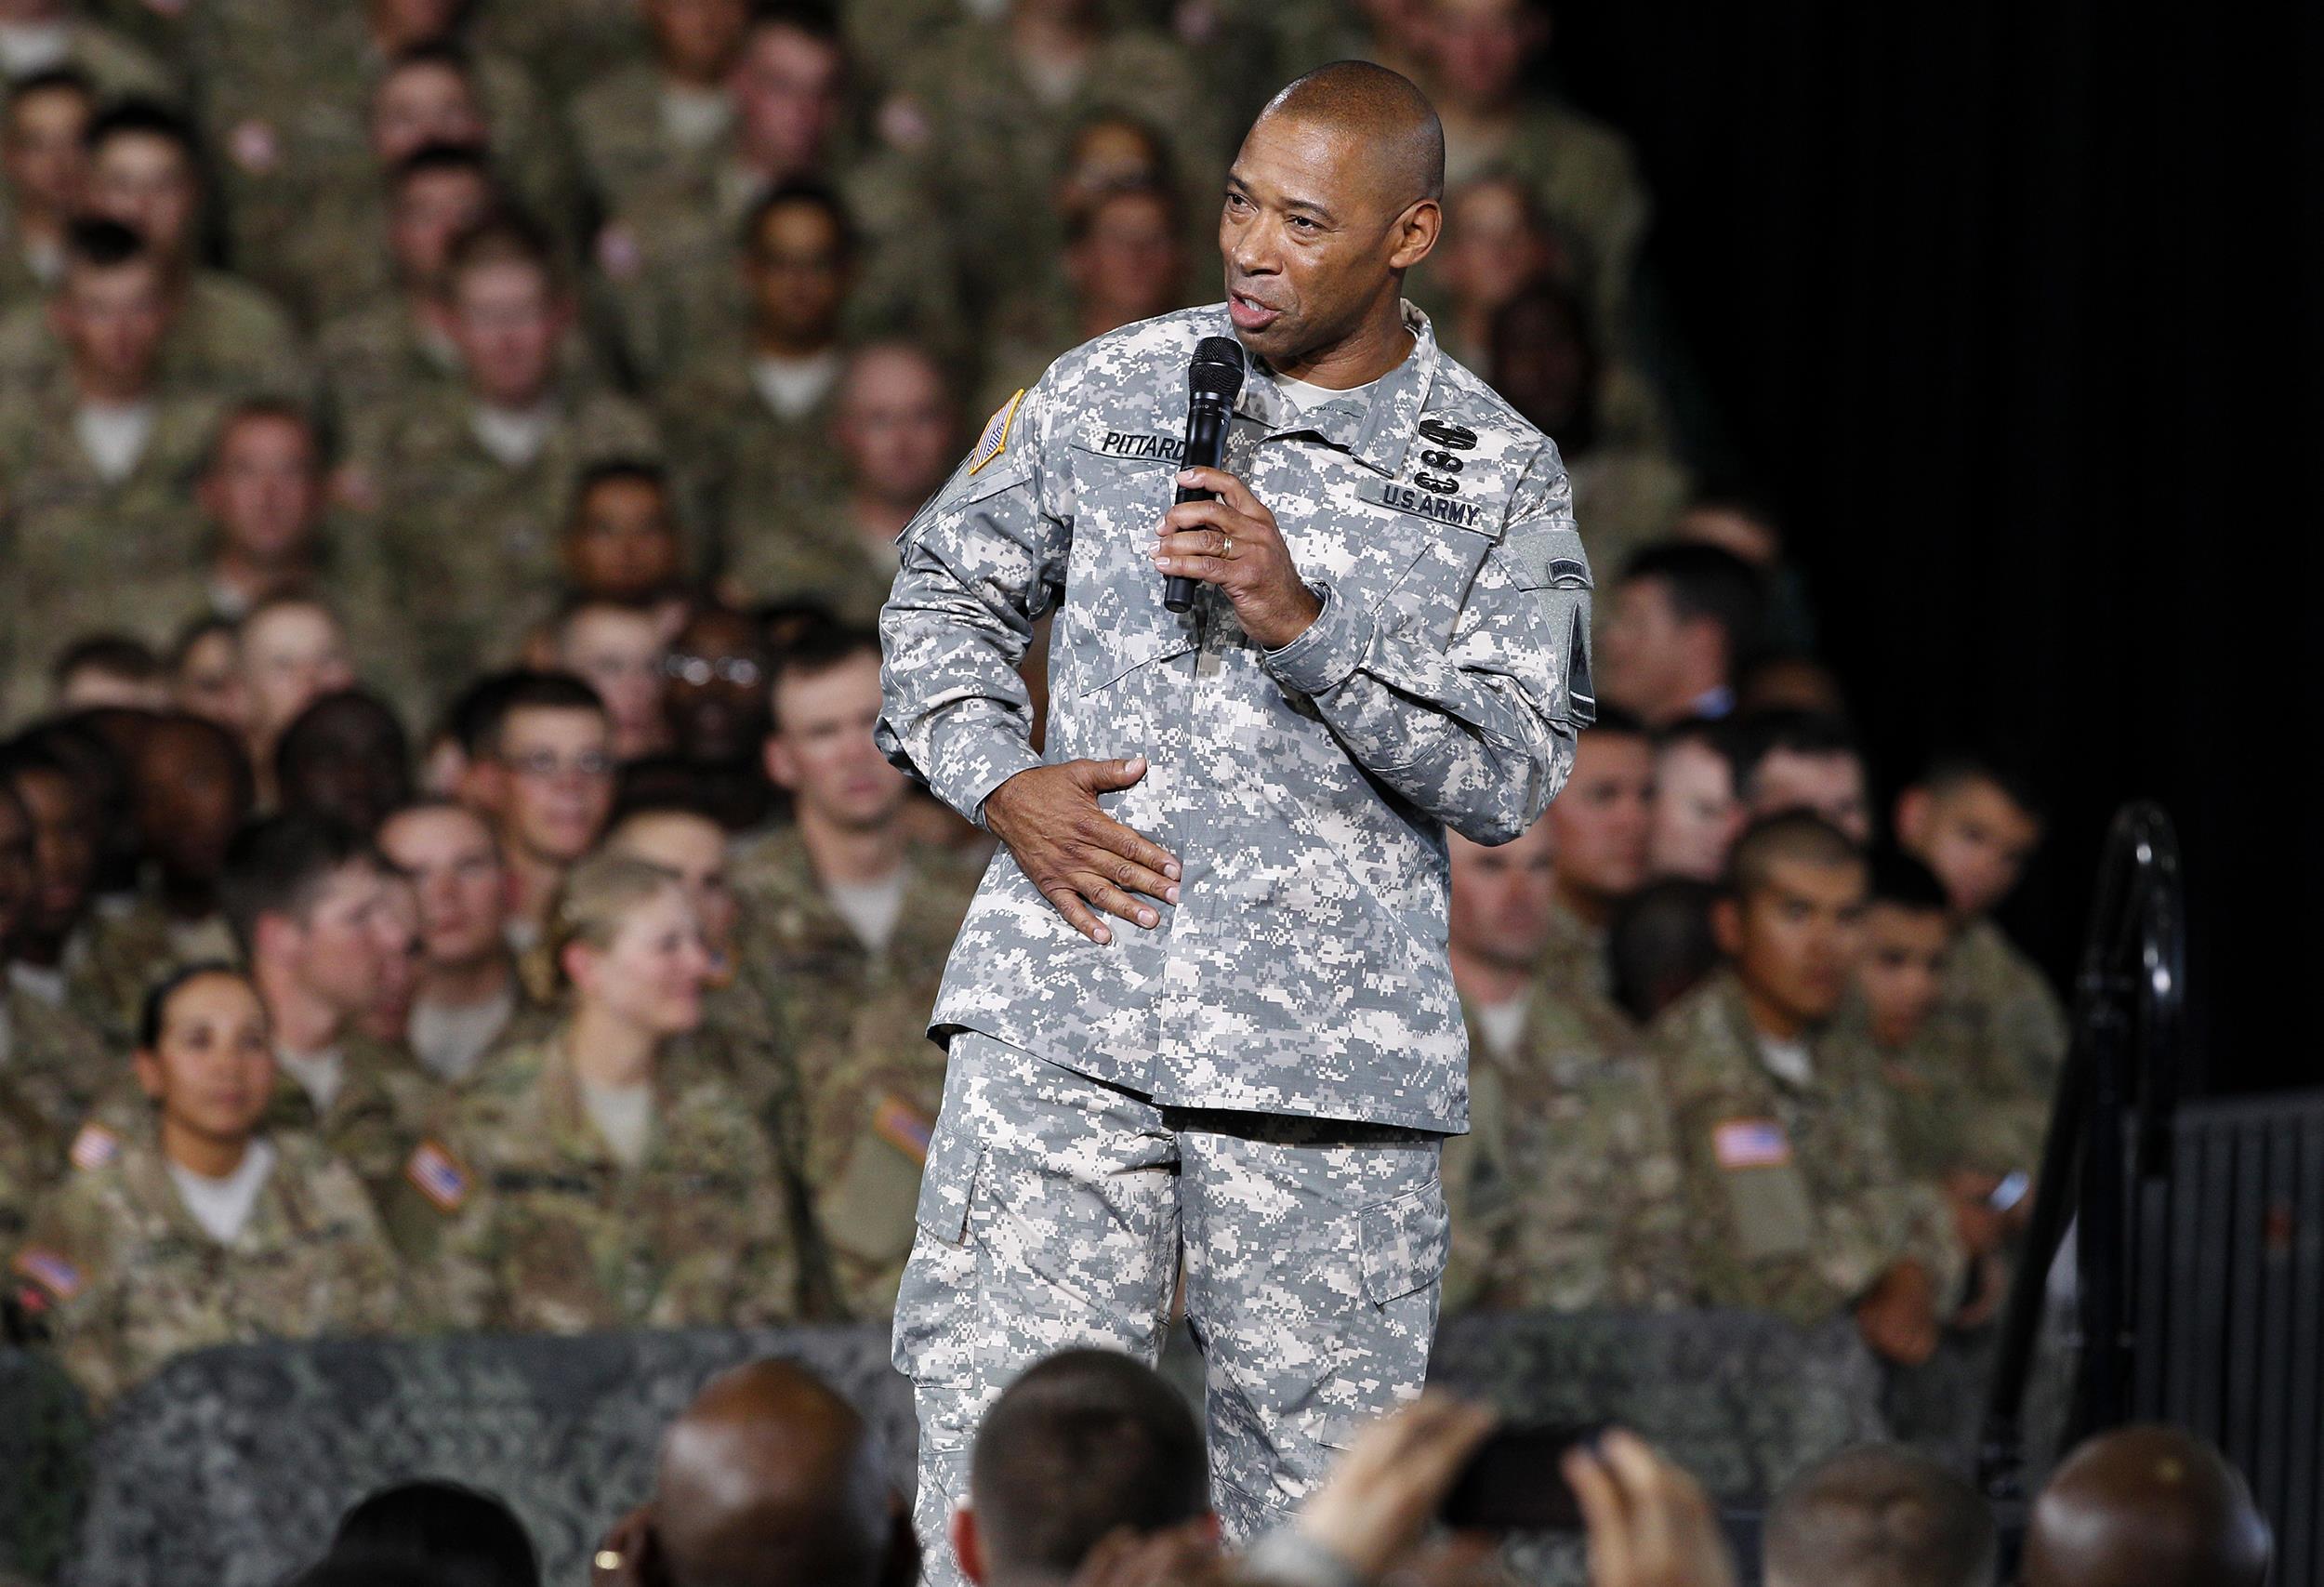 Image: Major General Dana J.H. Pittard in 2012